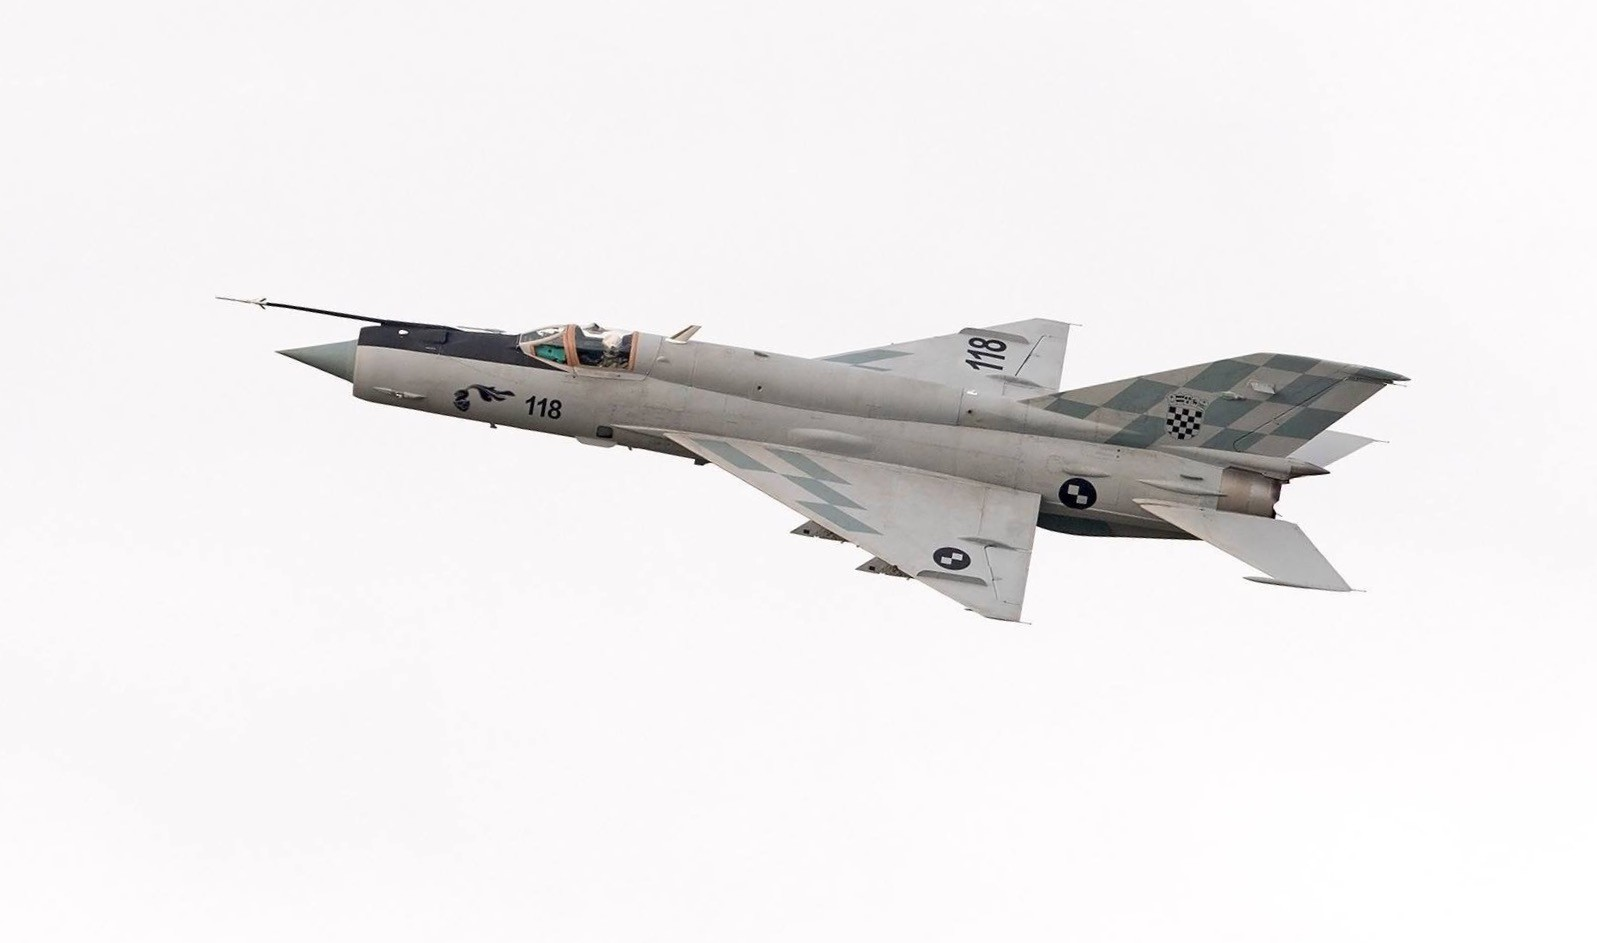 Hrvatski MiG-21BisD